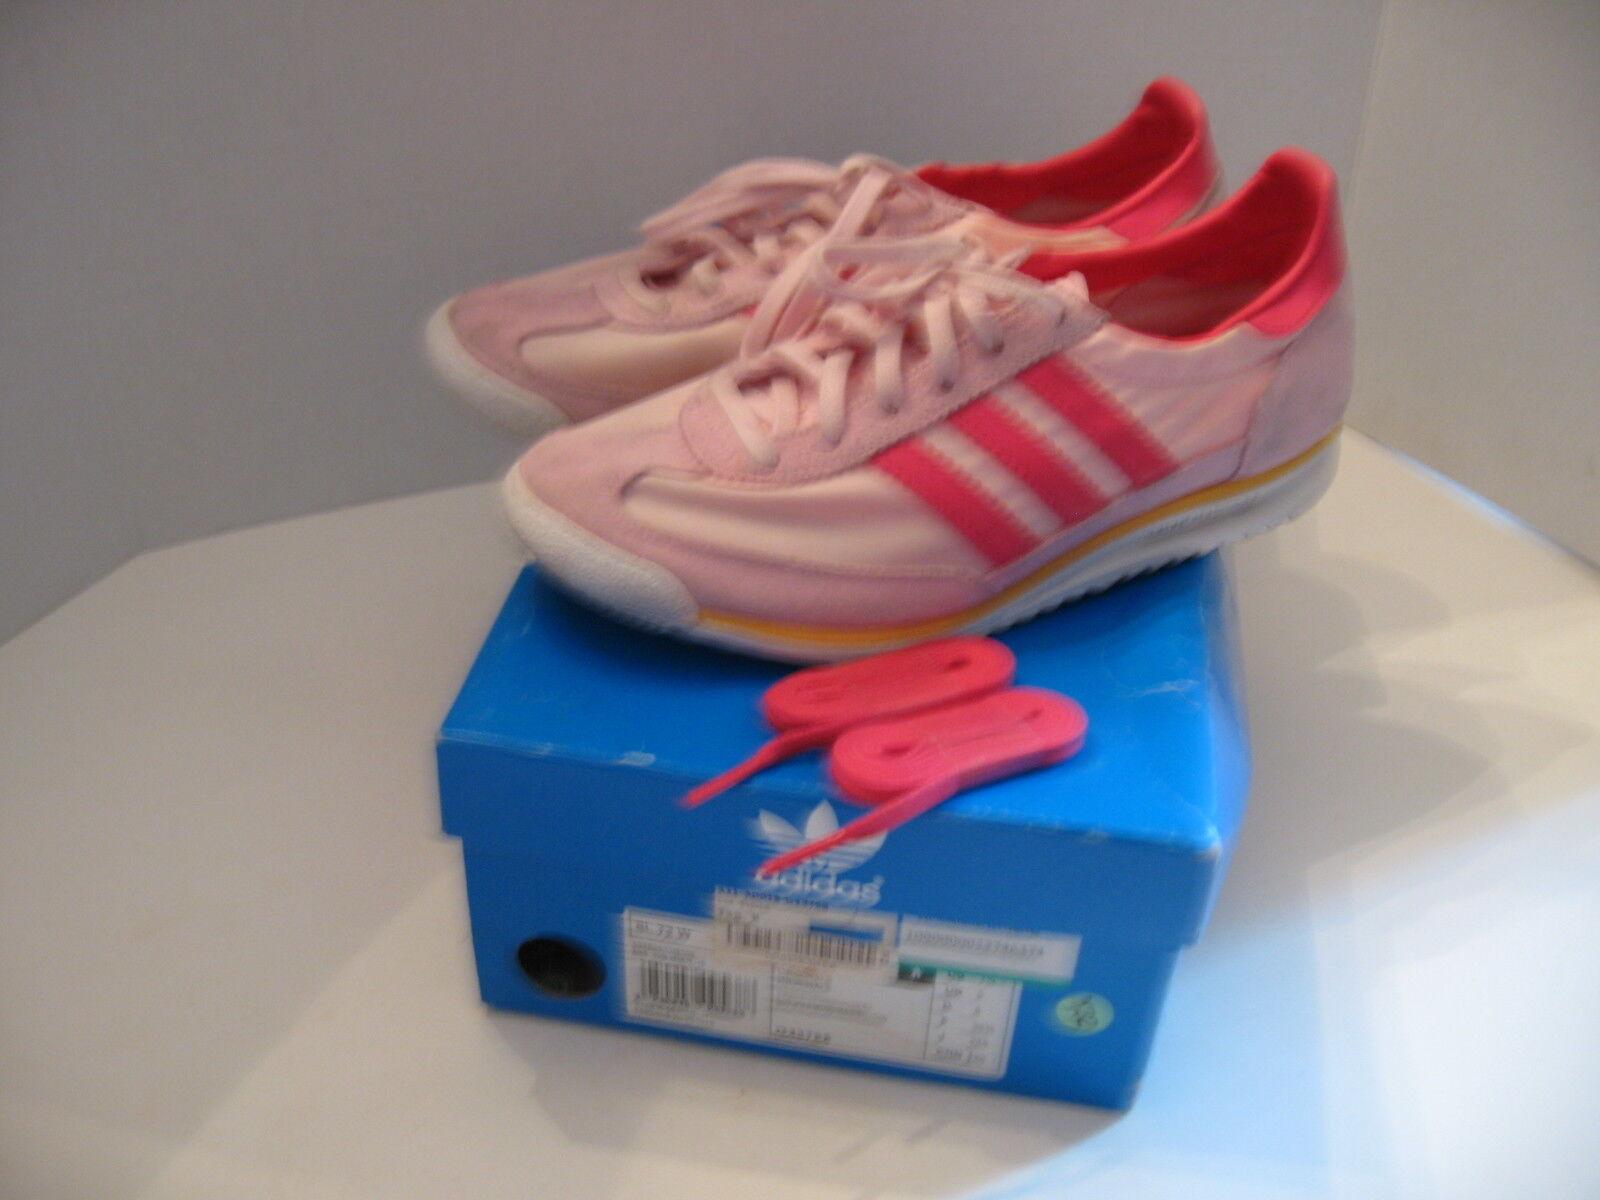 PINK ADIDAS ORIGINALS SL 72 Retro Training Track Shoes With Box Size Womens 7.5